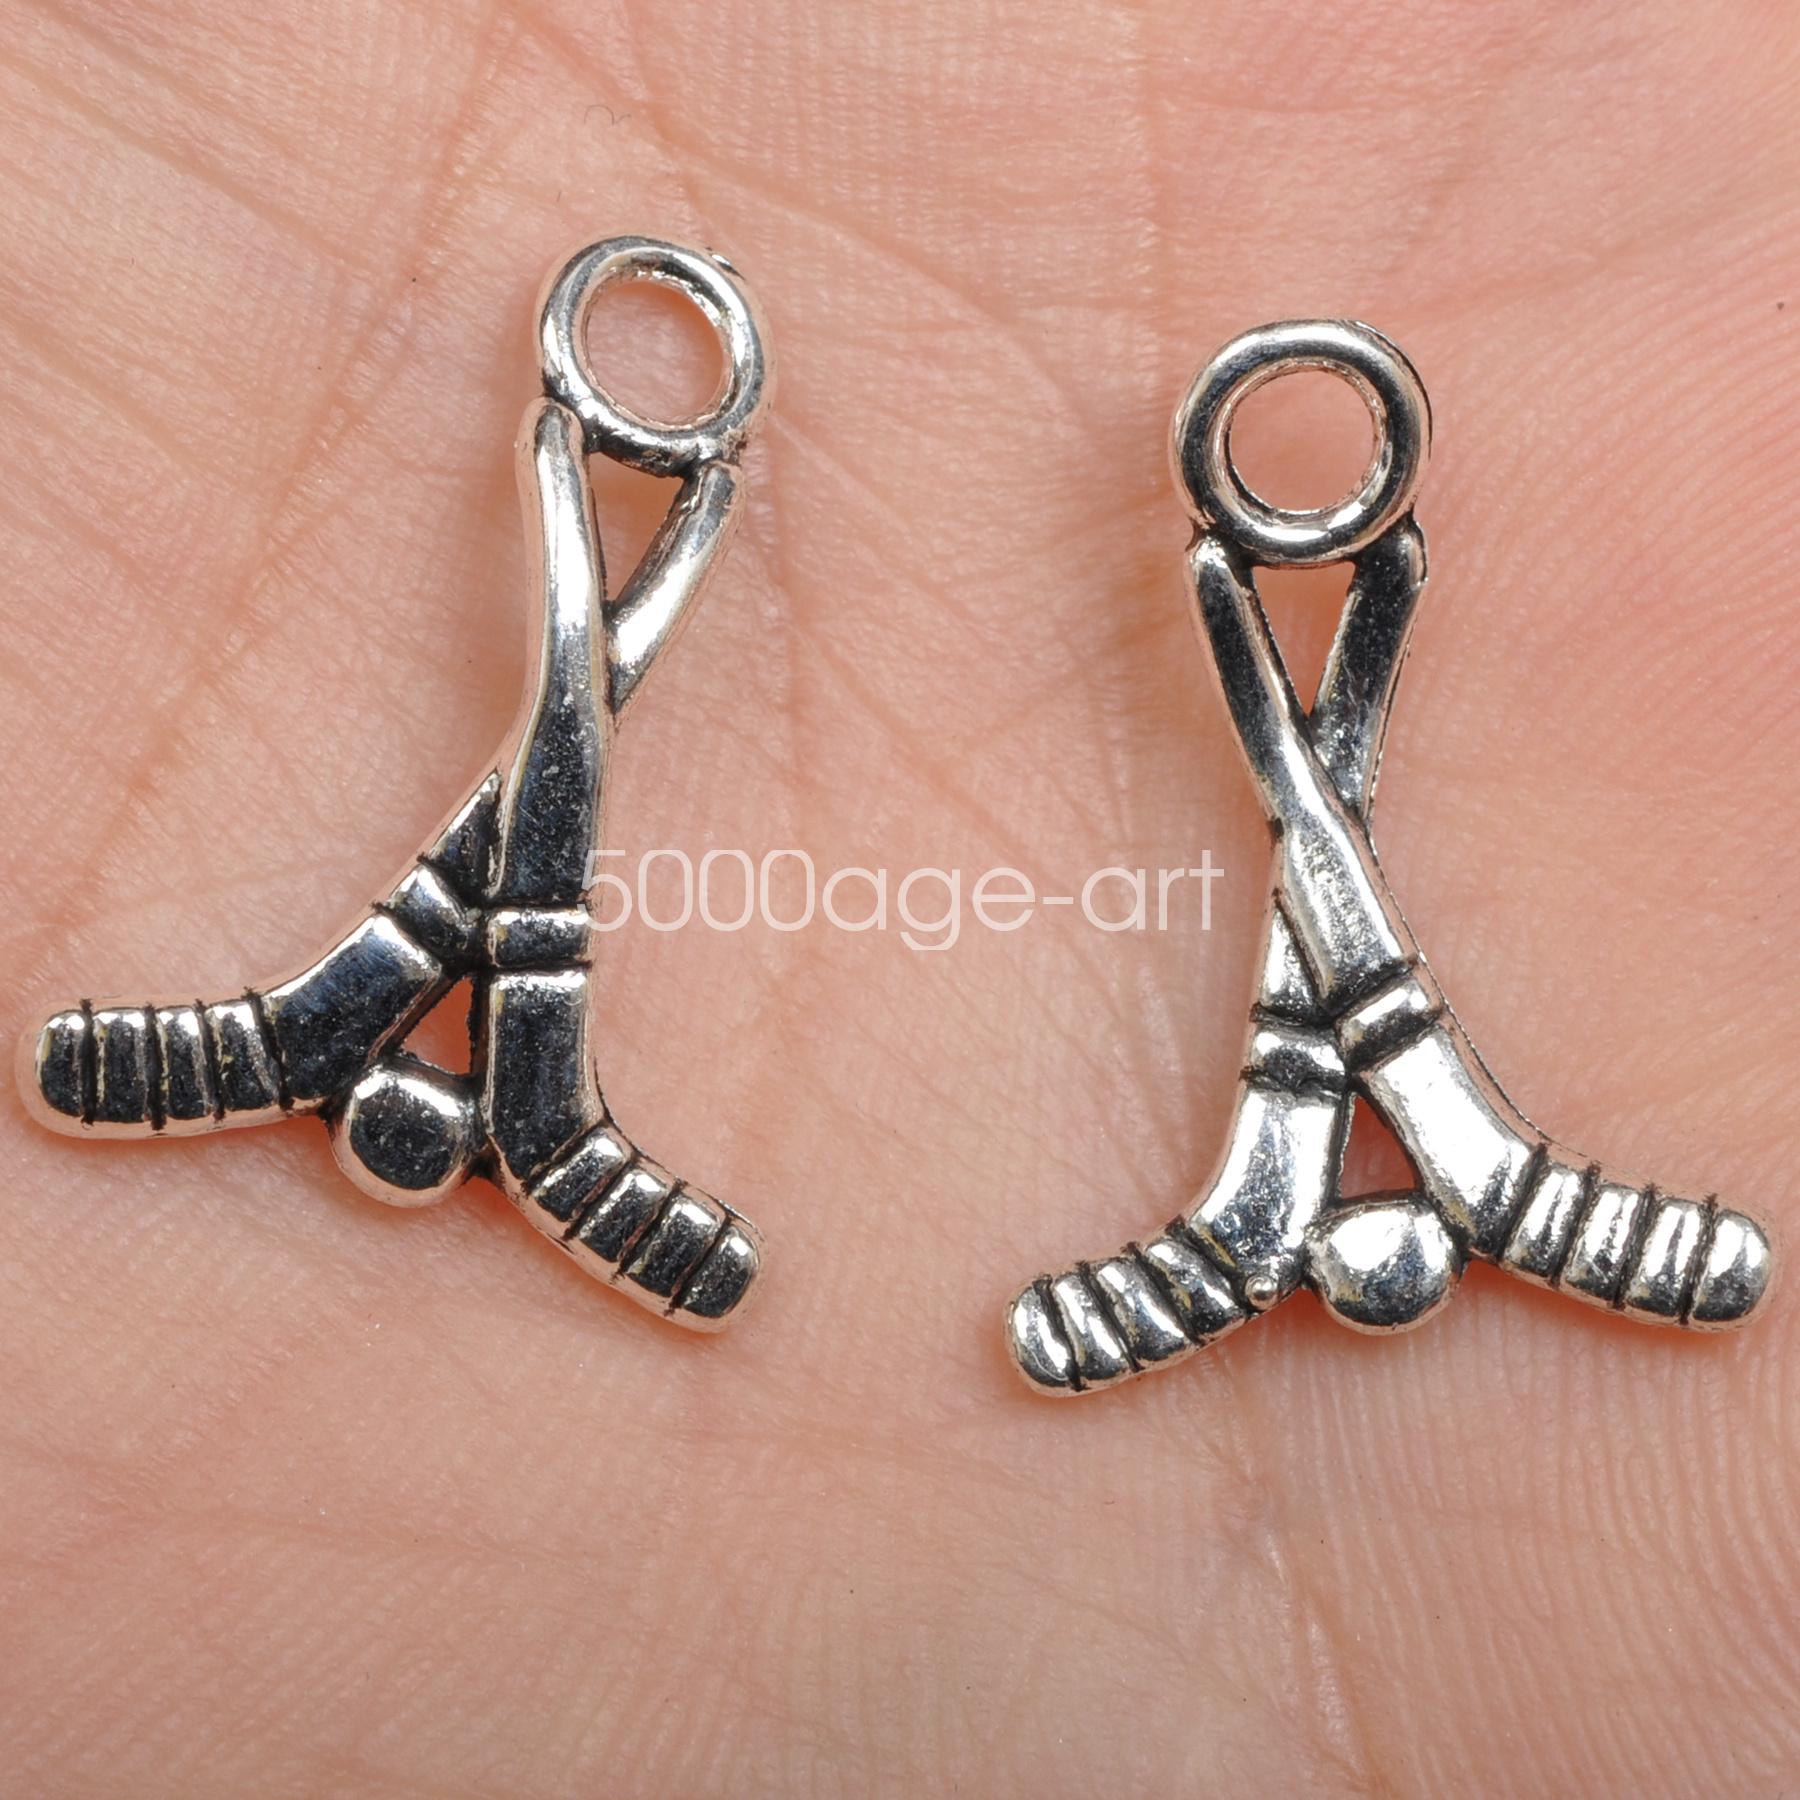 40pcs tibetan silver color Hockey sticks design charms necklace pendants A3551